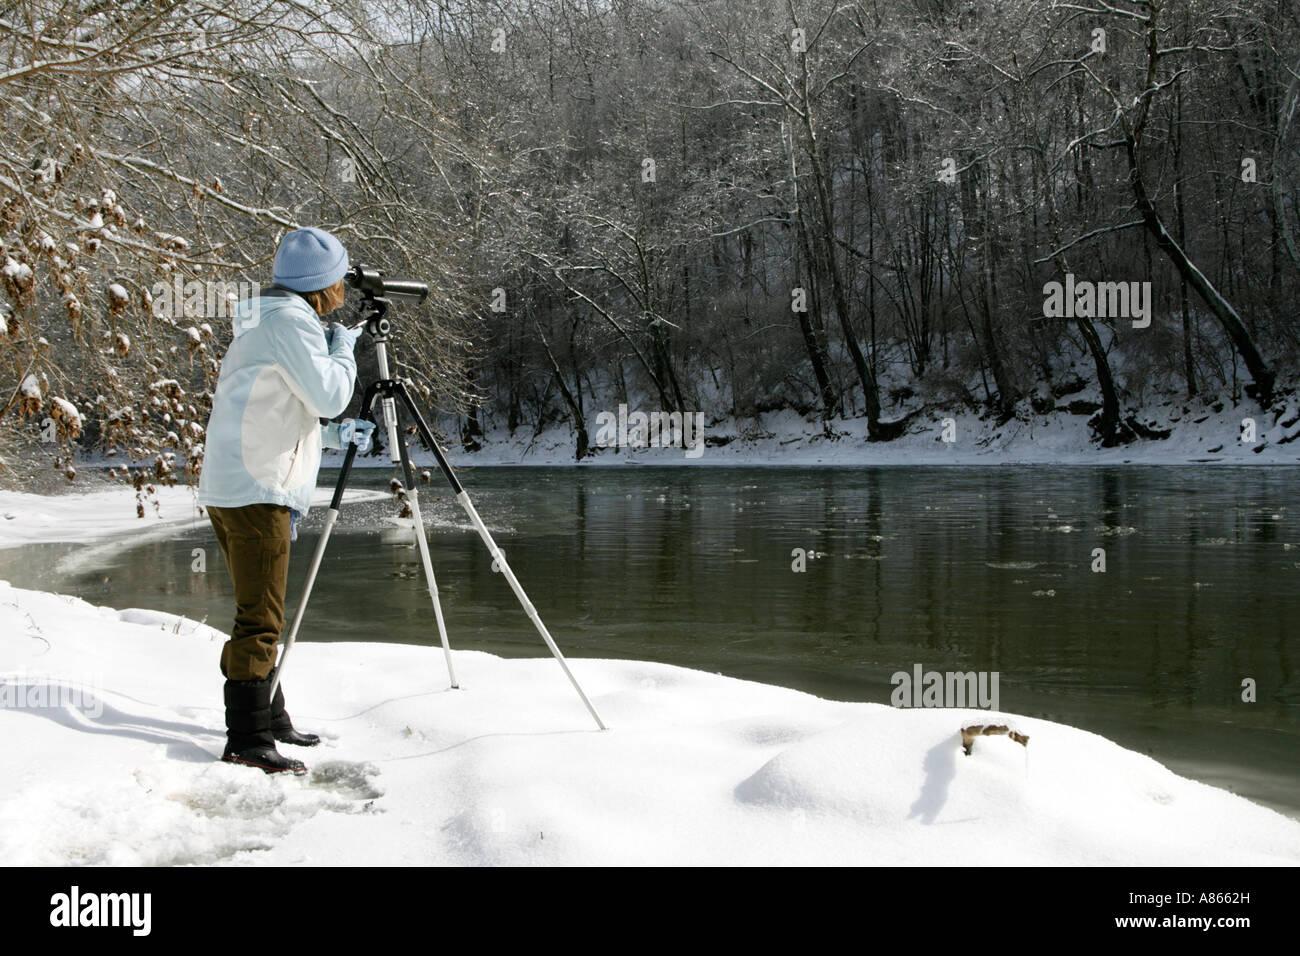 Winter Birdwatcher using Spotting Scope - Stock Image